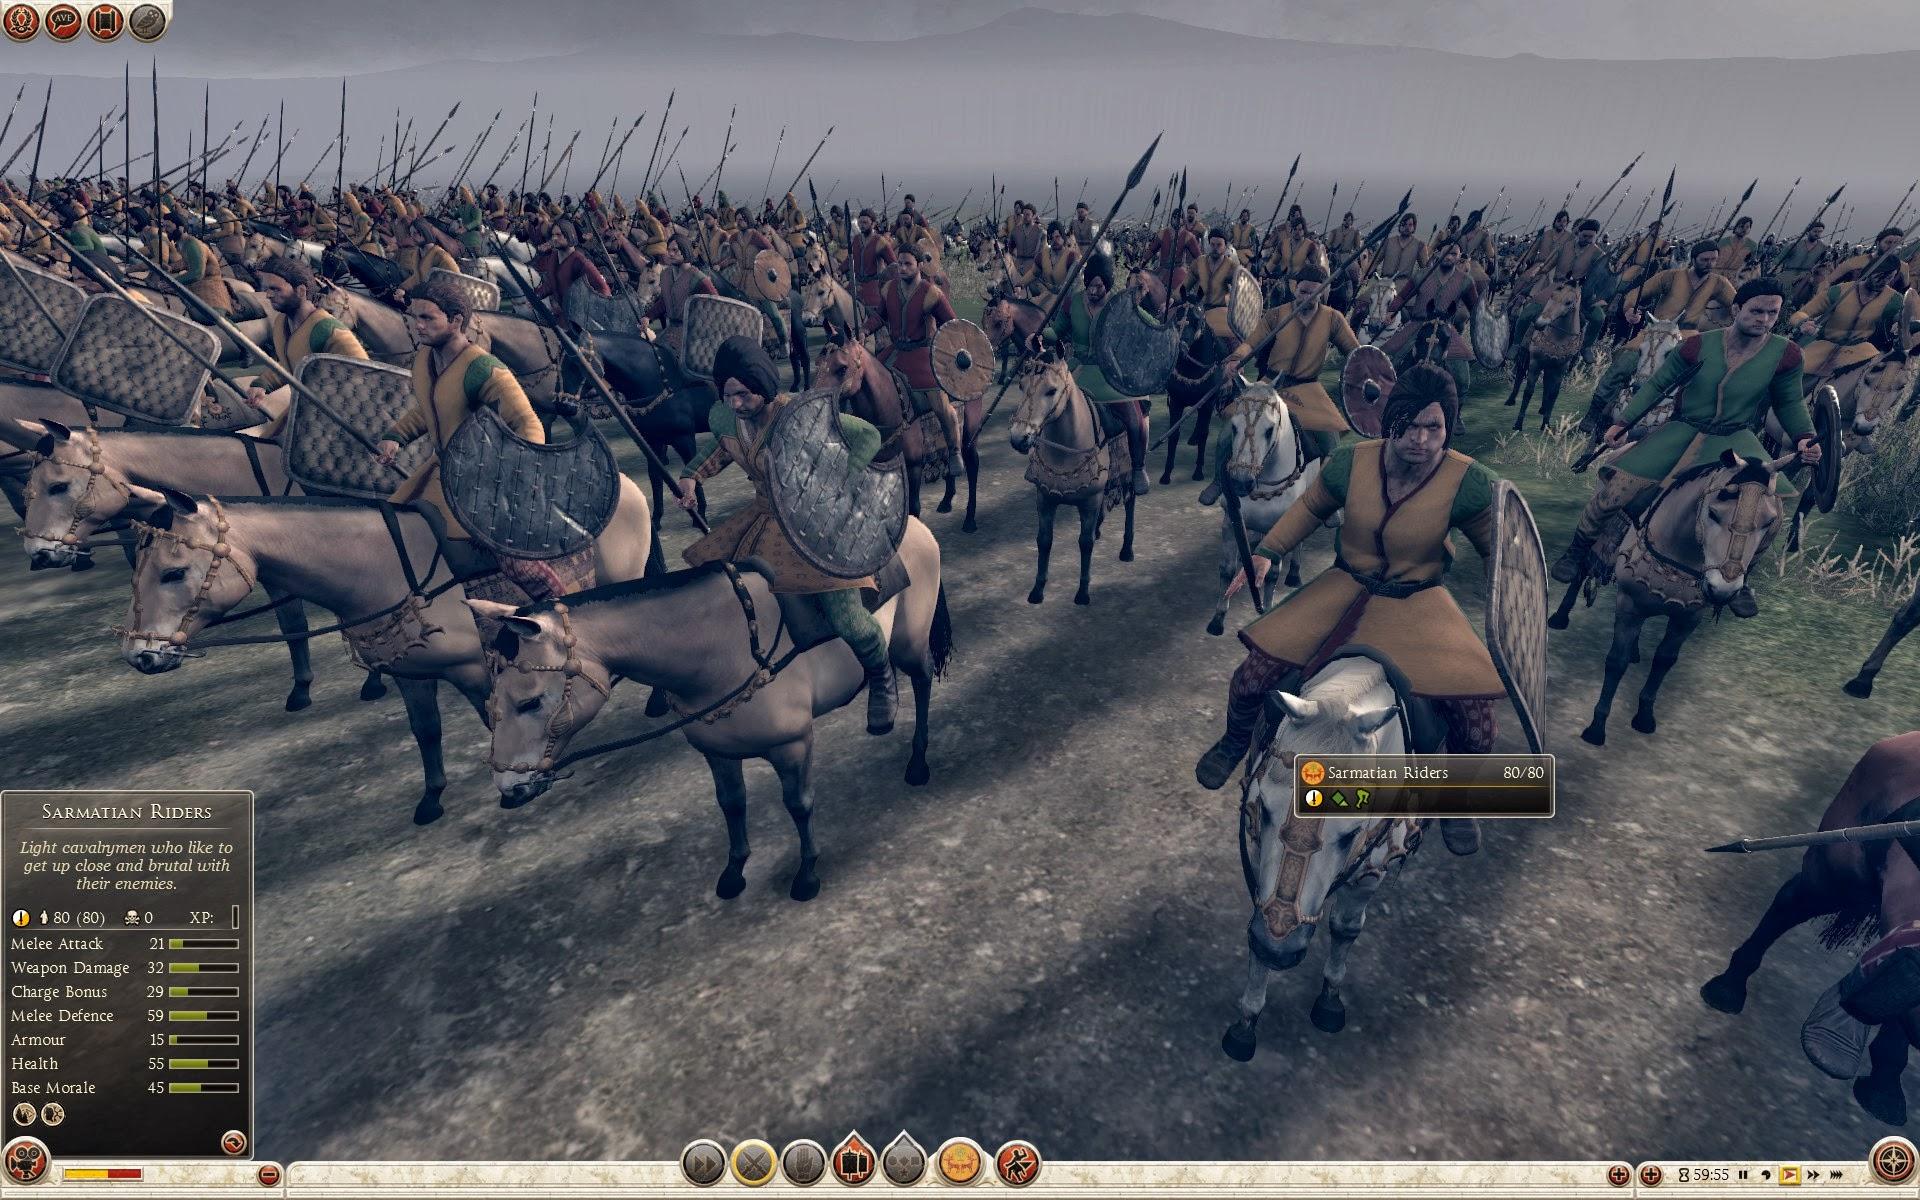 Sarmatian Riders